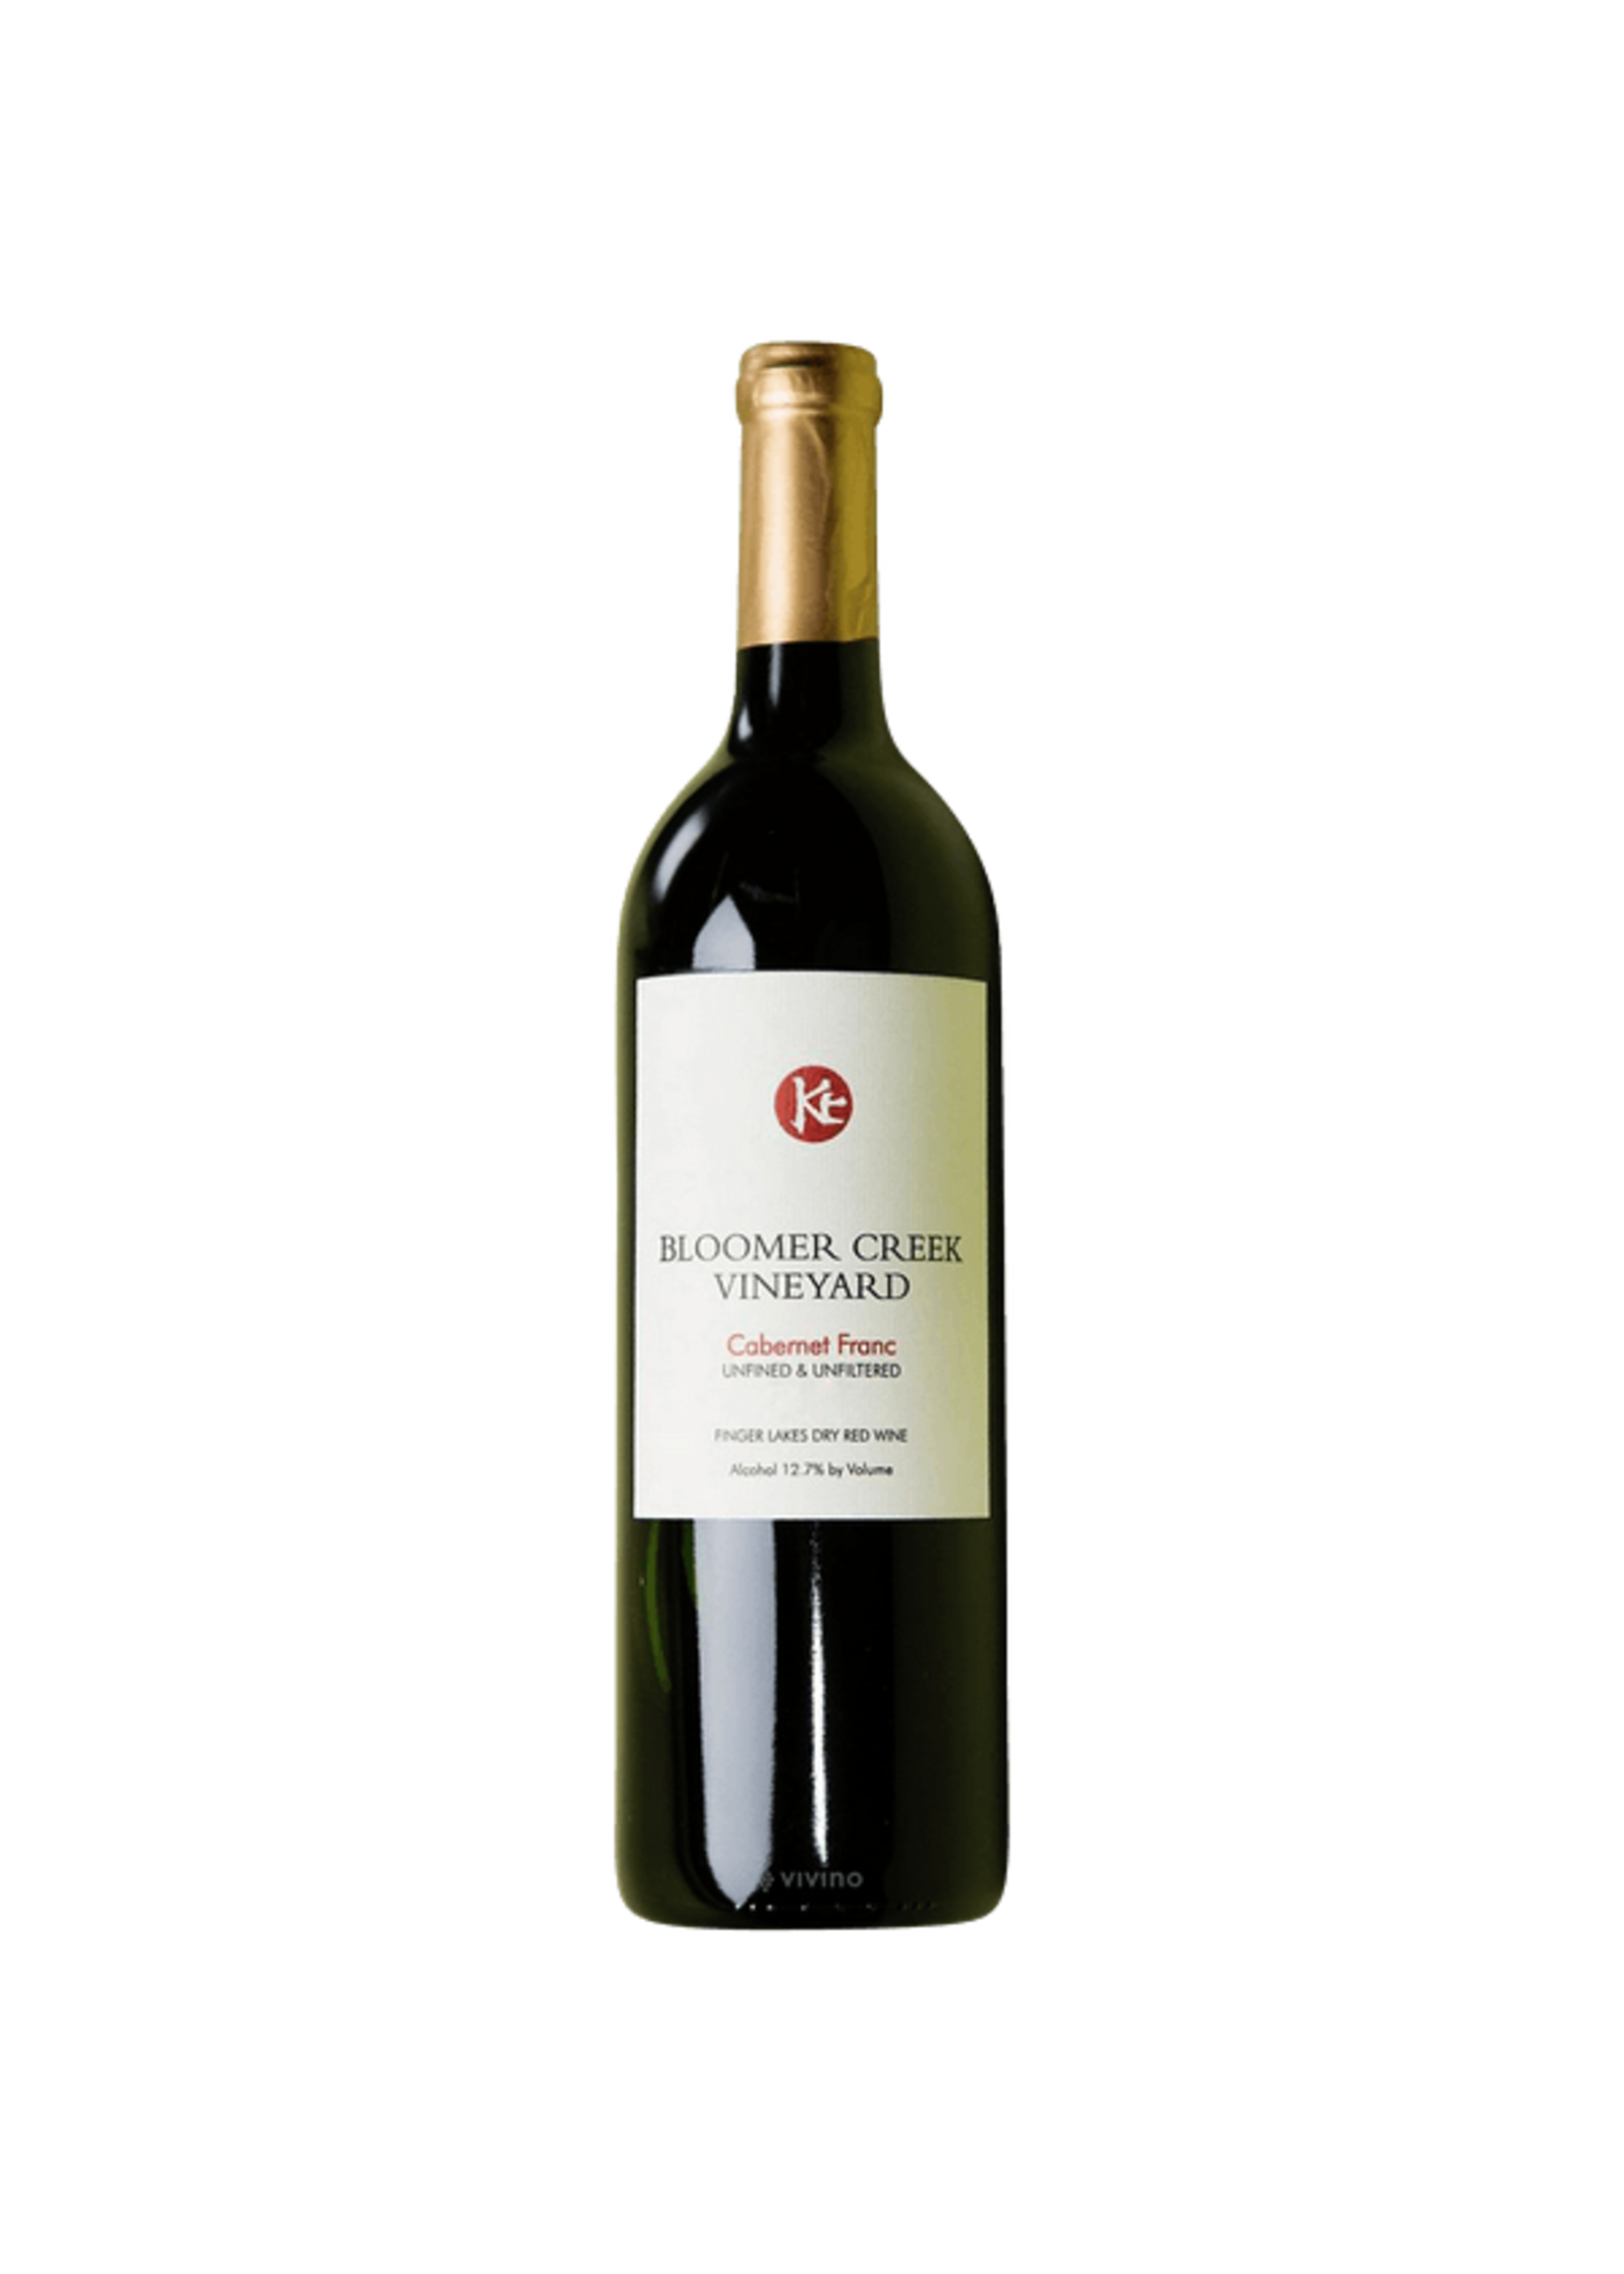 Bloomer Creek Vineyard Bloomer Creek Vineyard / Cabernet Franc (2016) / 750mL